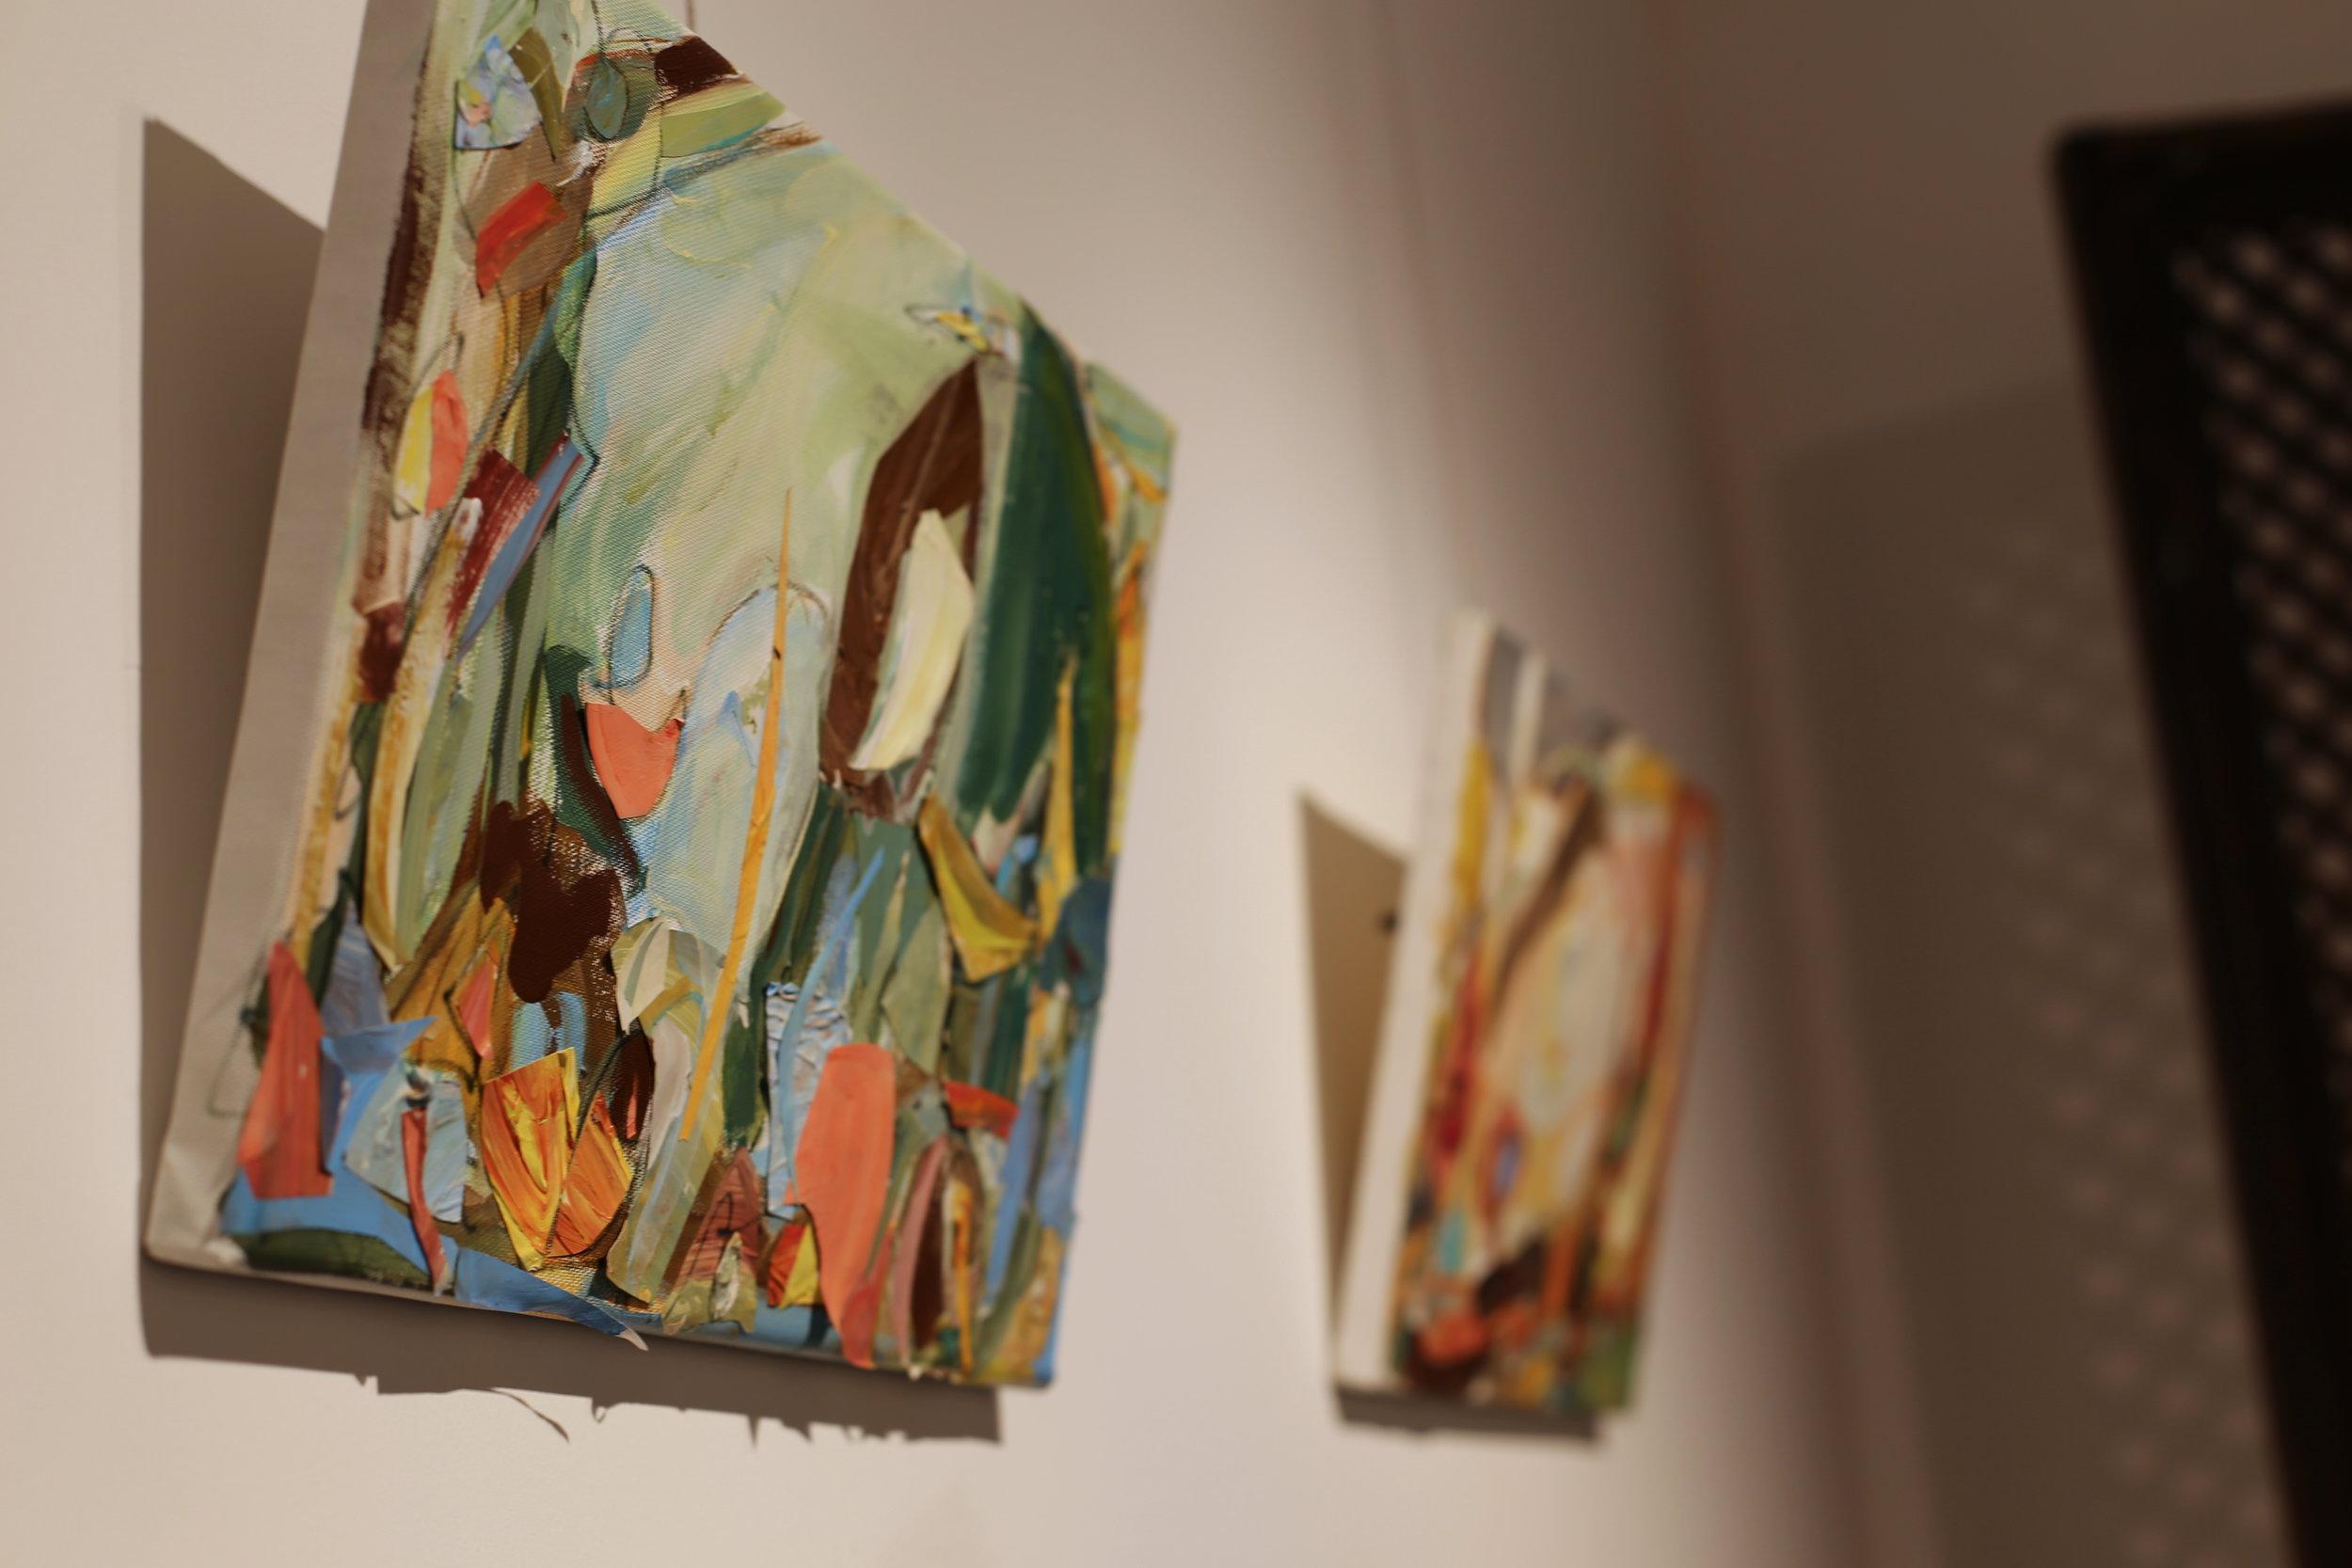 Artworks on display